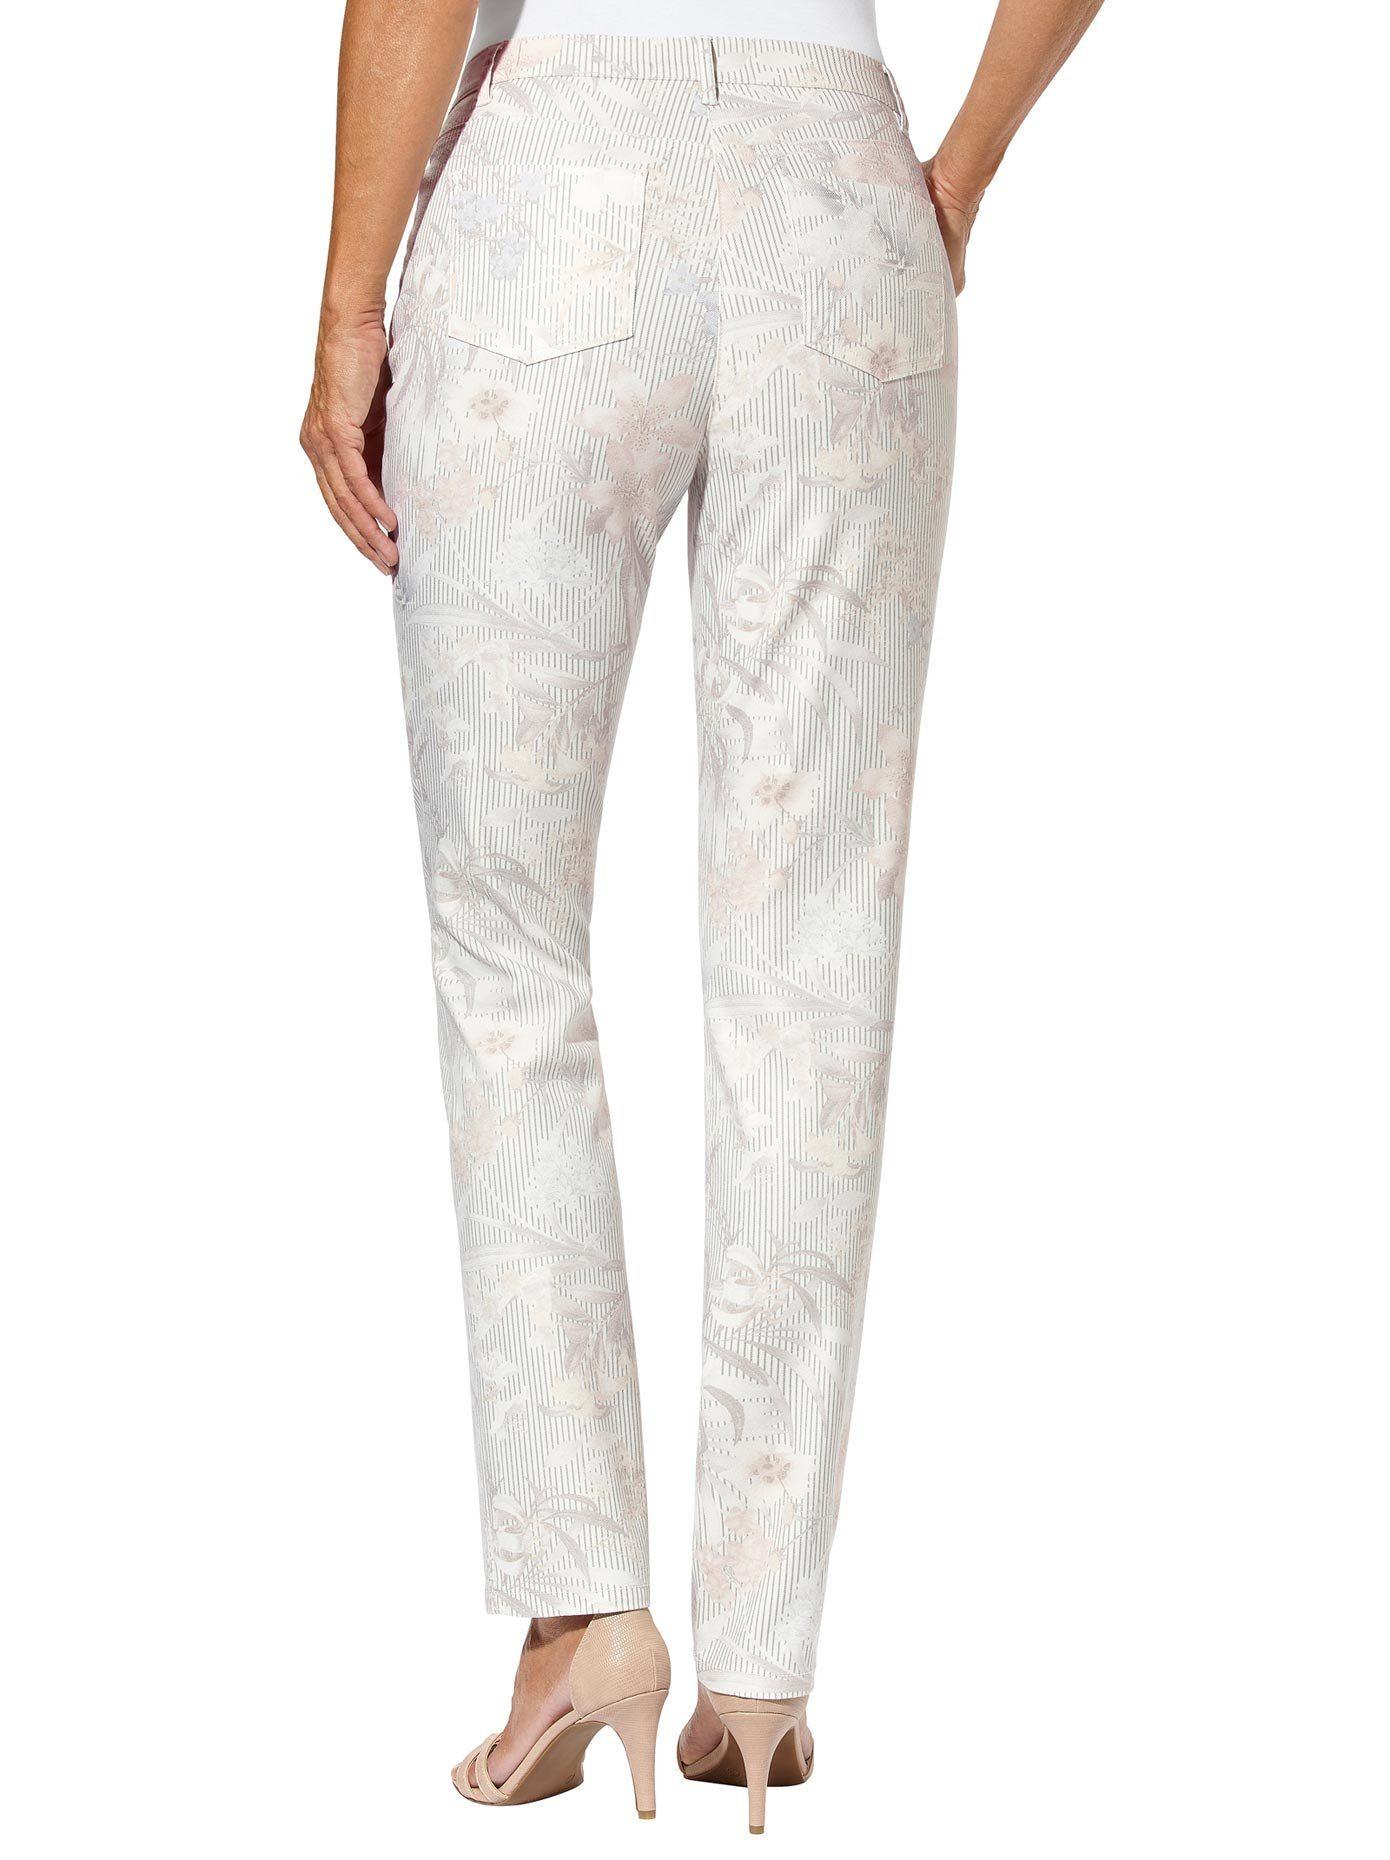 Cosma 5-Pocket-Hose, mit 65% Baumwolle